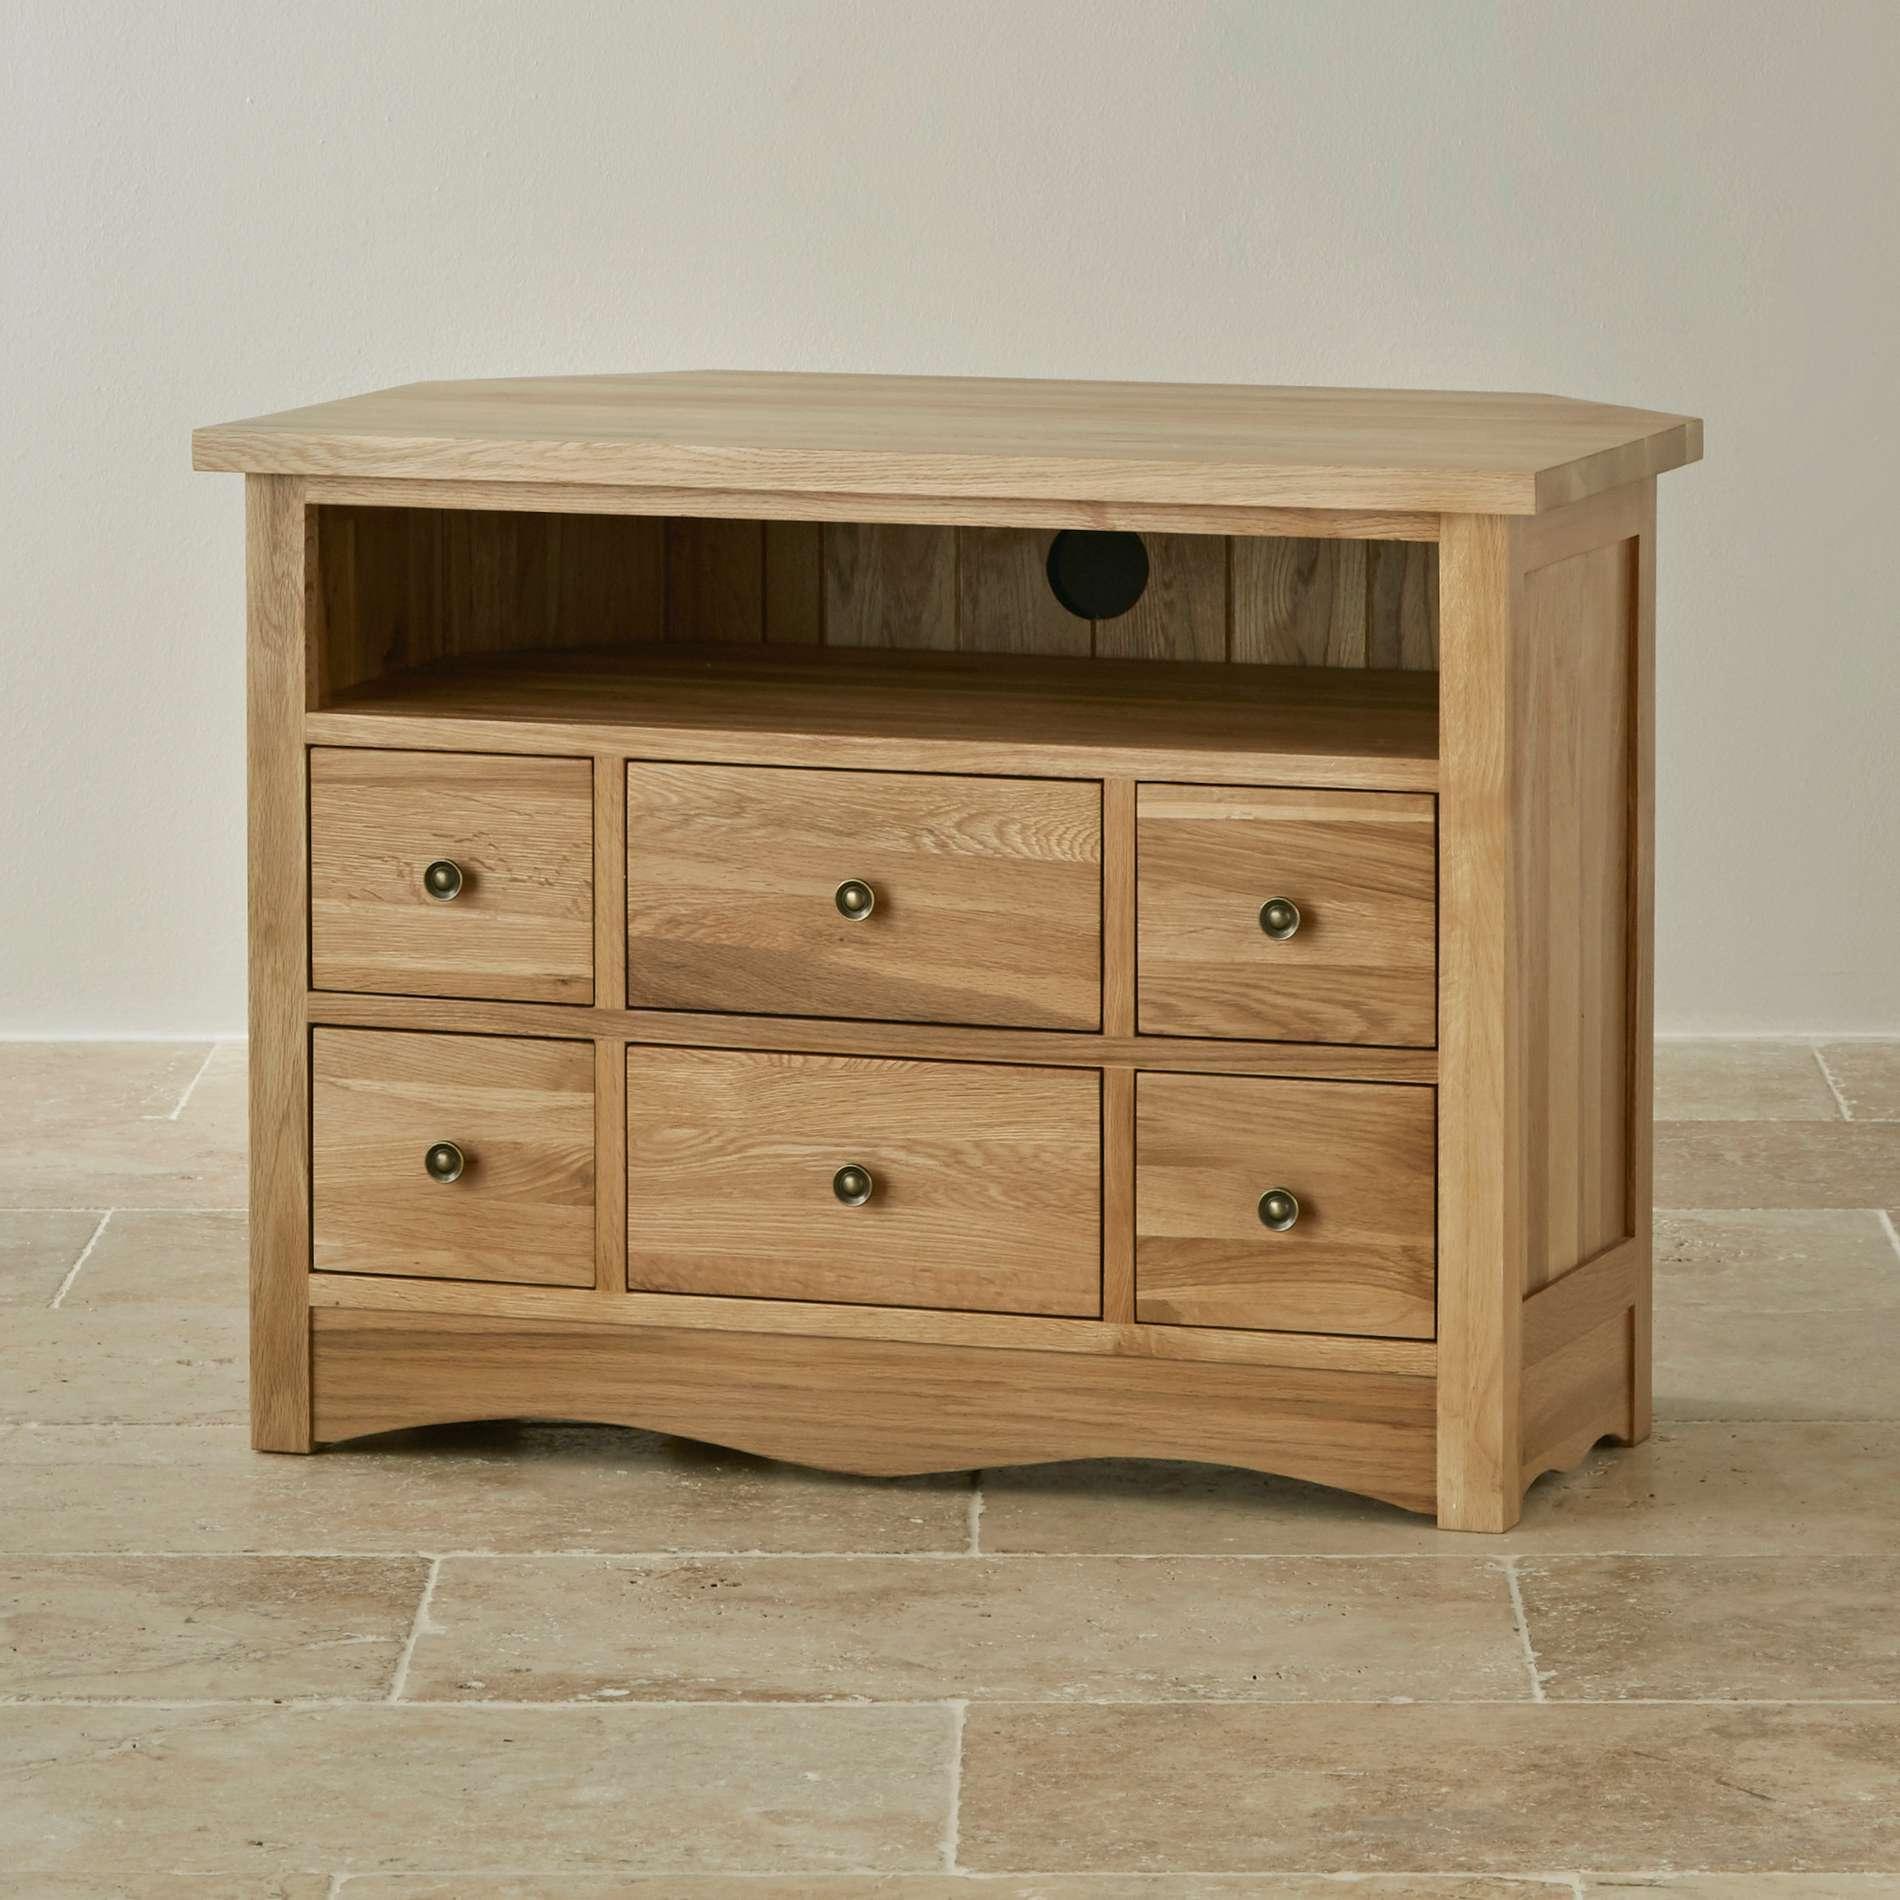 Elegant Oak Corner Tv Stand 24 On Small Home Remodel Ideas With For Small Oak Corner Tv Stands (View 14 of 15)